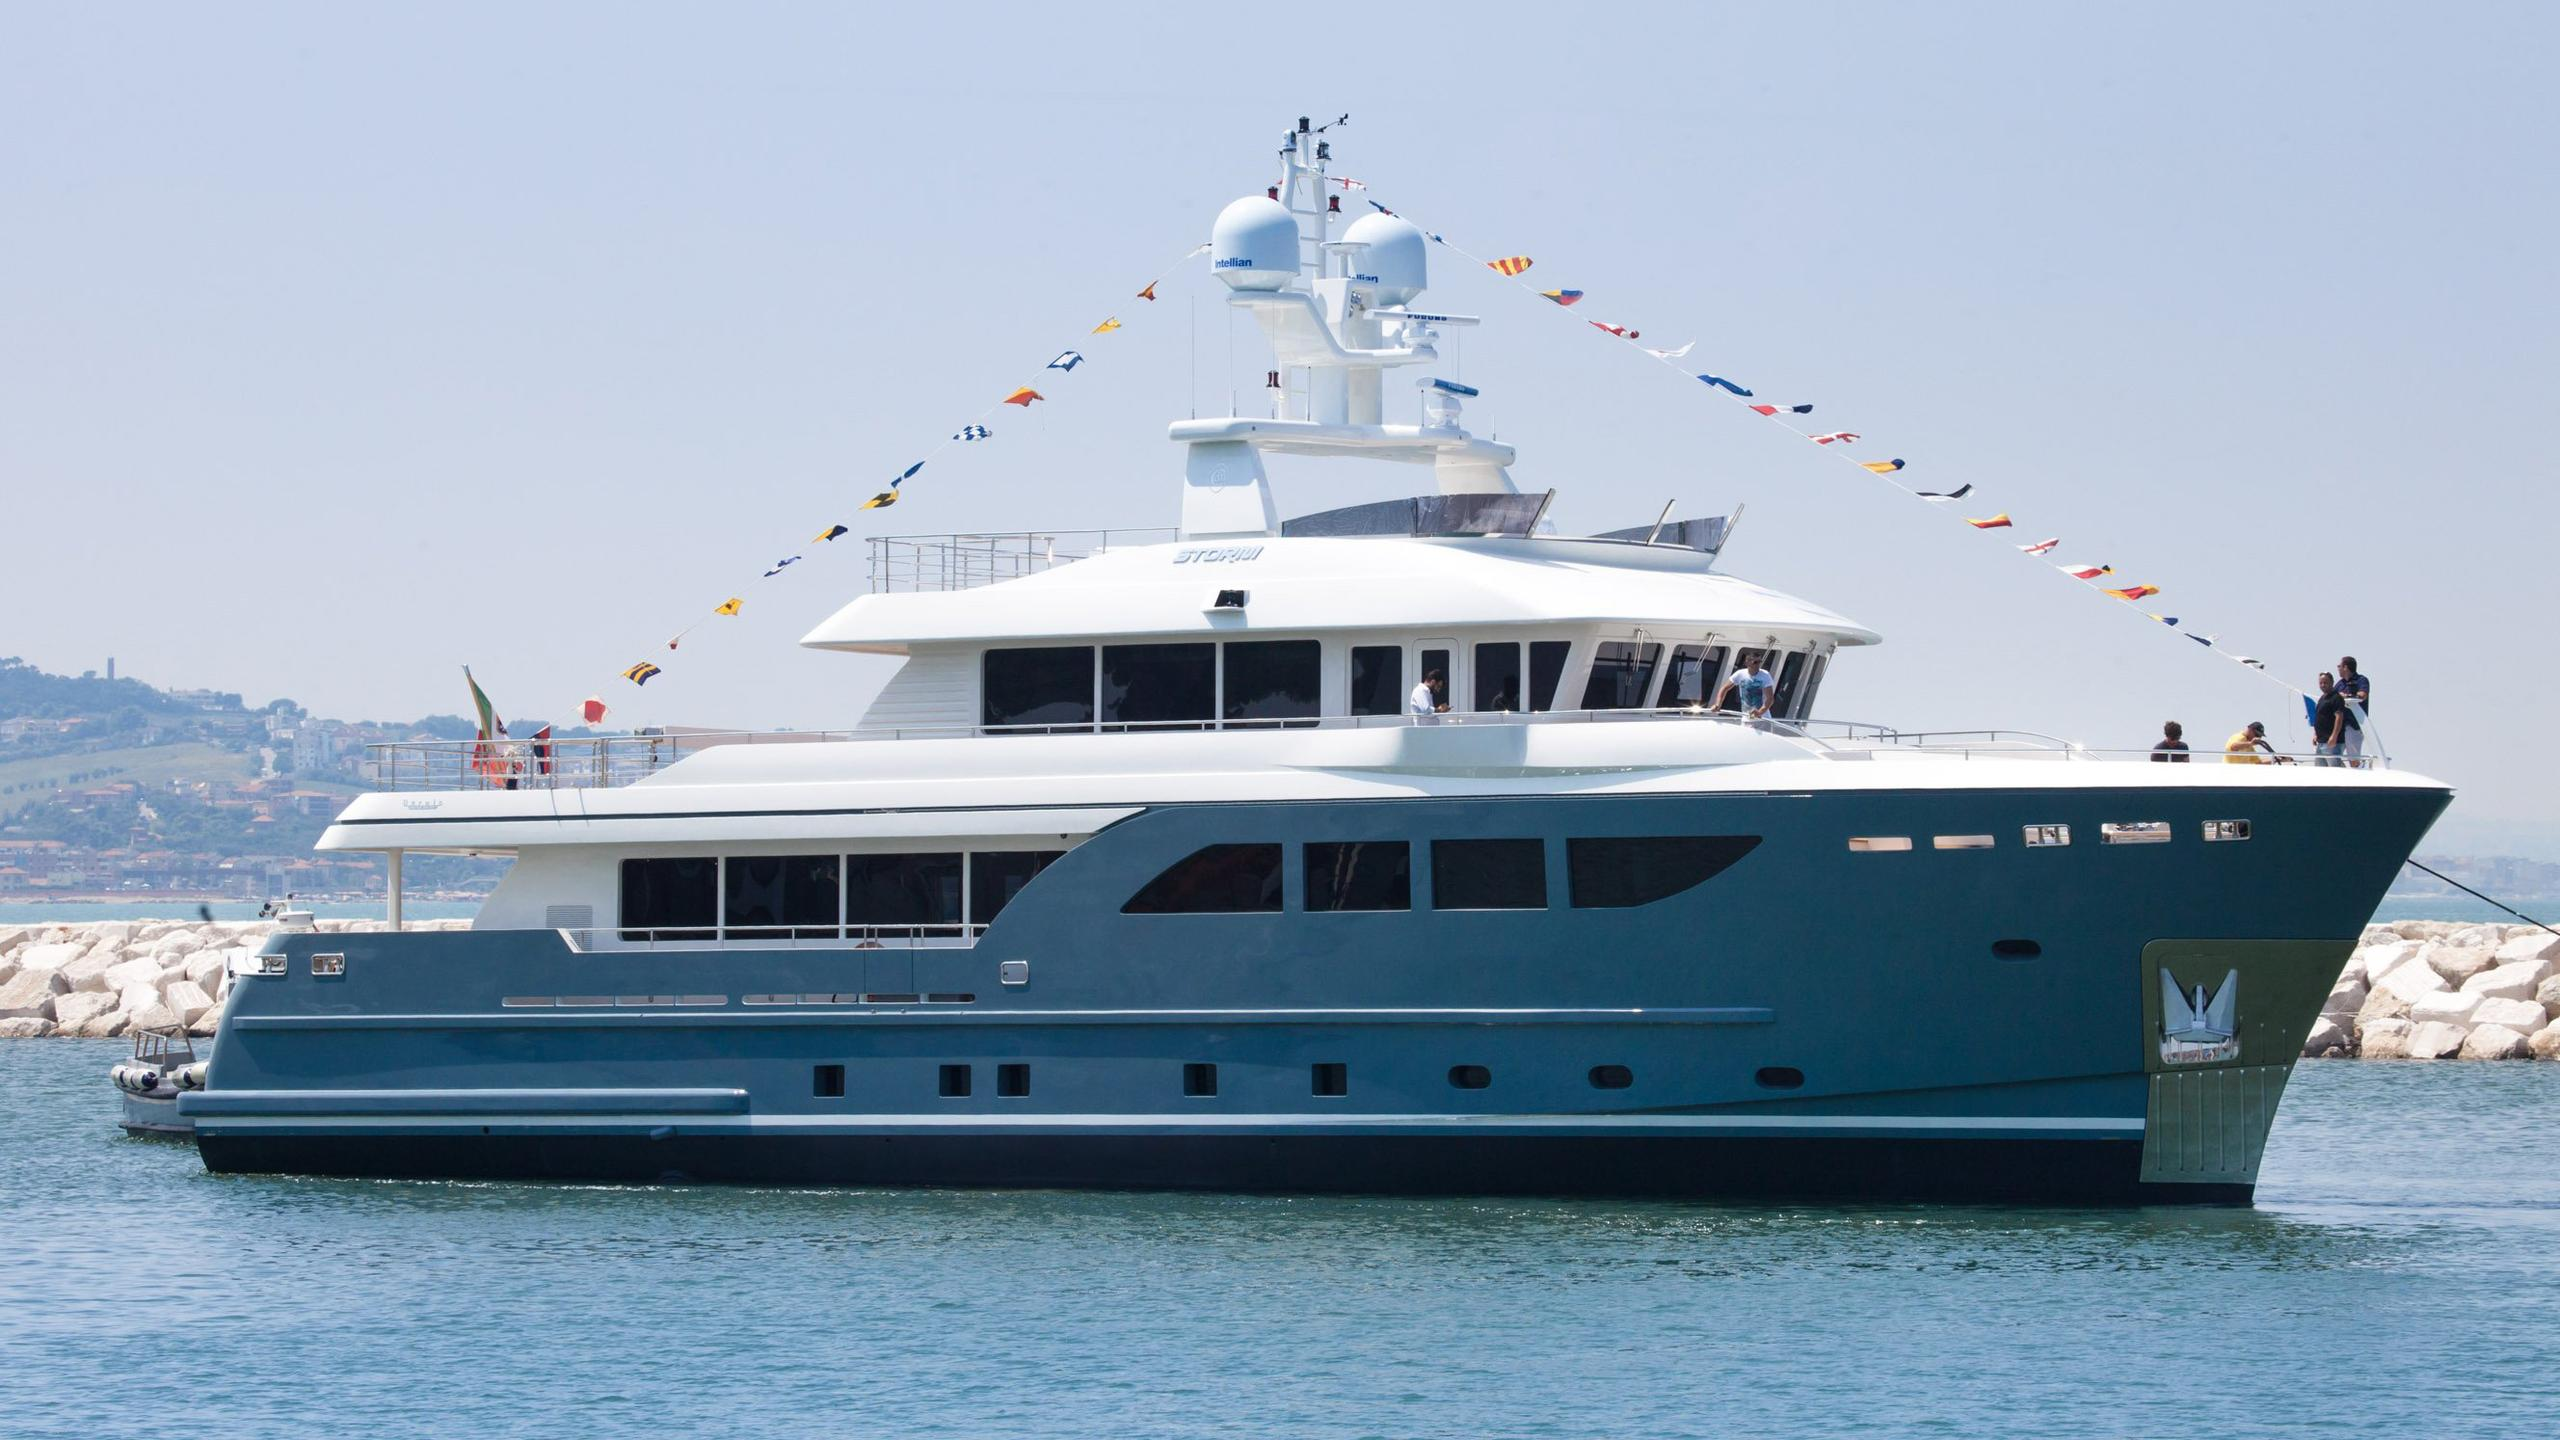 storm-motor-yacht-cantiere-dell-marche-darwin-107-2015-33m-profile